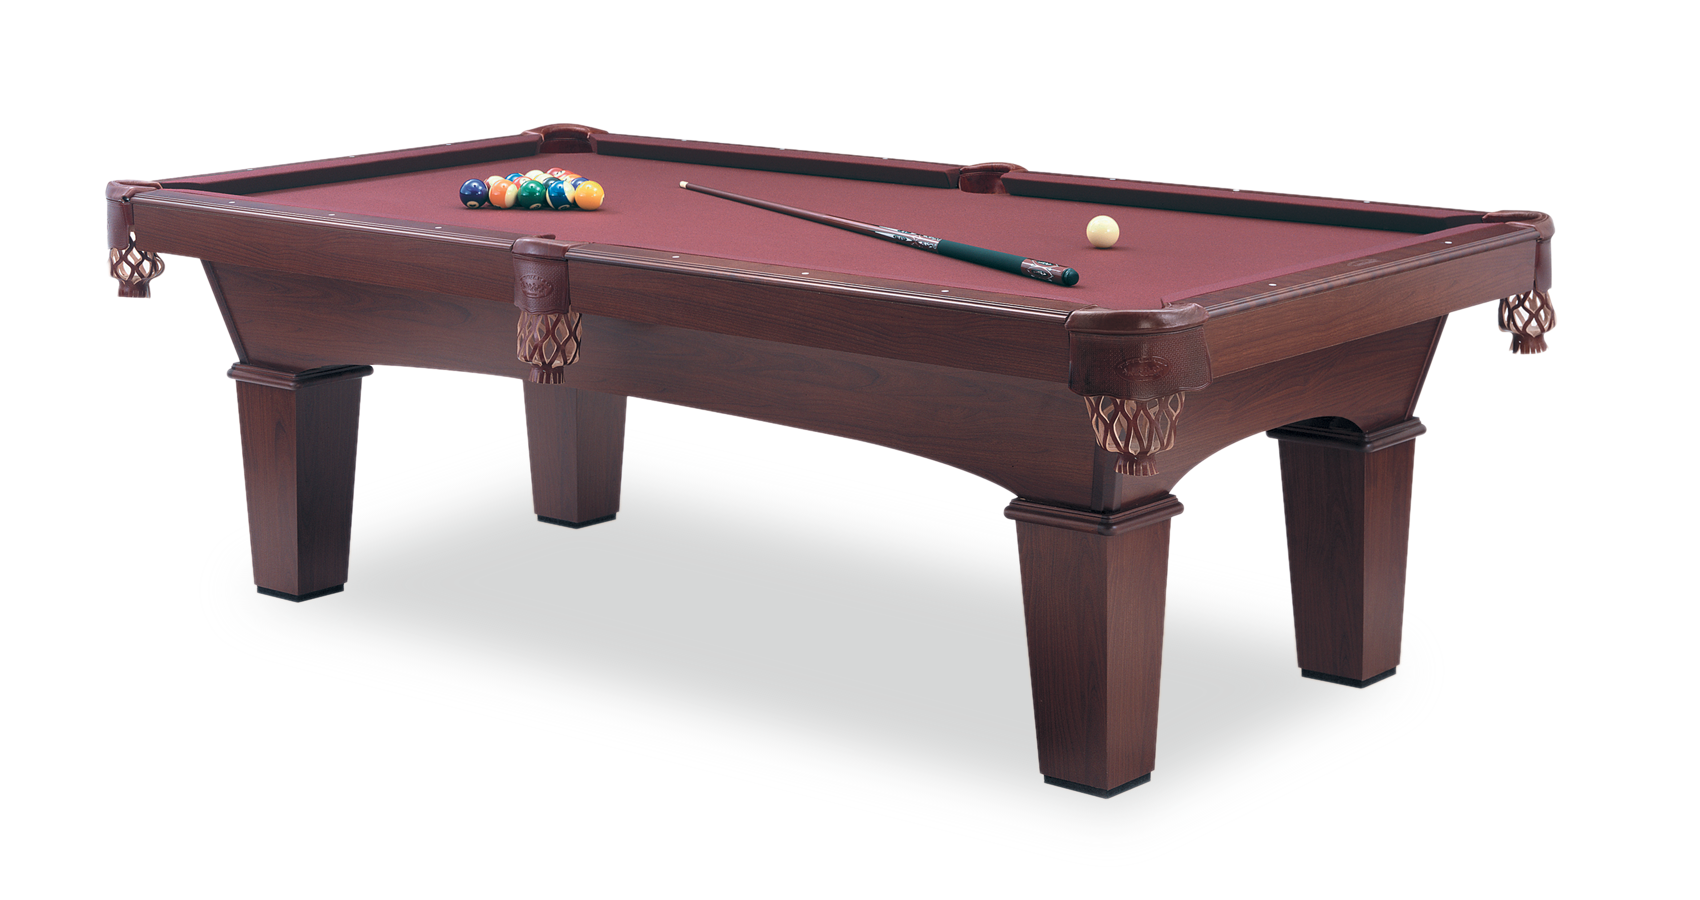 Olhausen Reno Pool Table Skillful Home Recreation - Pool table sliders